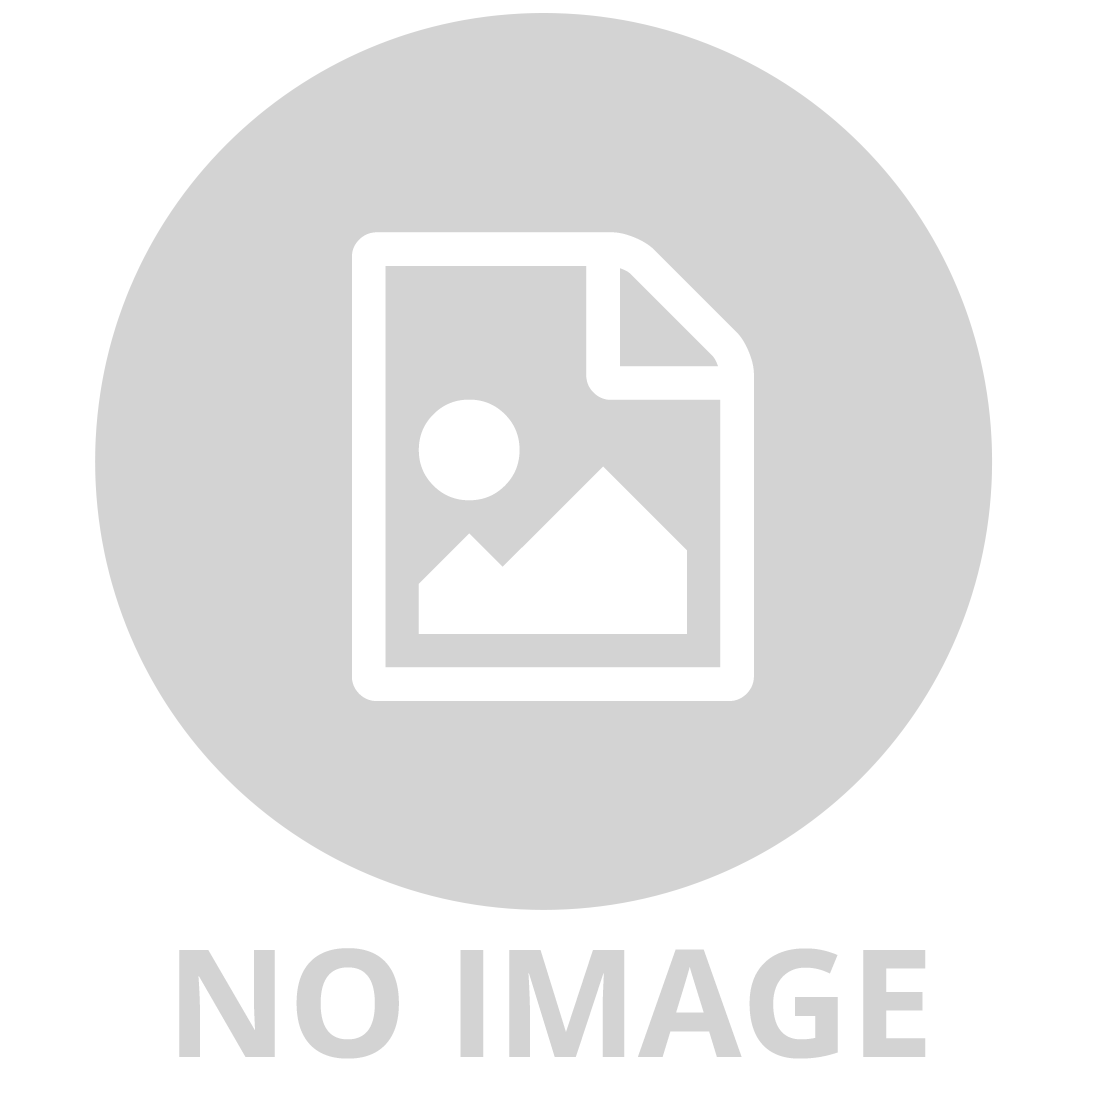 LEGO FRIENDS 41414 EMMA'S SUMMER PLAY CUBE